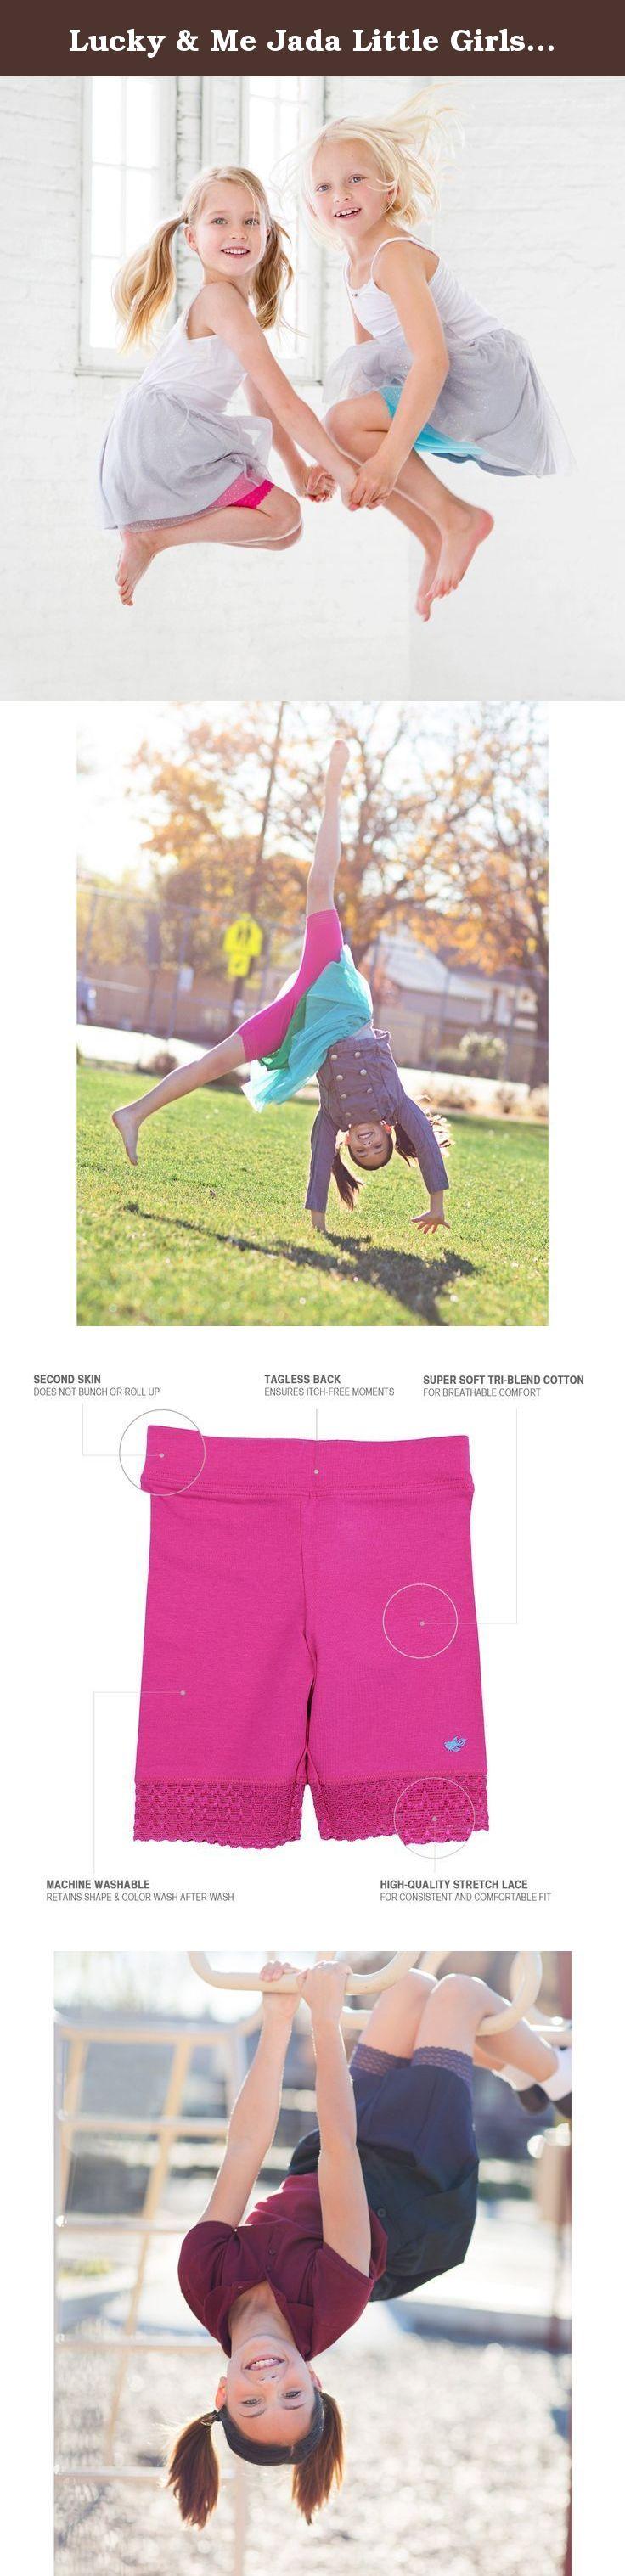 Lace Trim Jada Girls Bike Shorts Tagless Soft Cotton Underwear 3 Pack